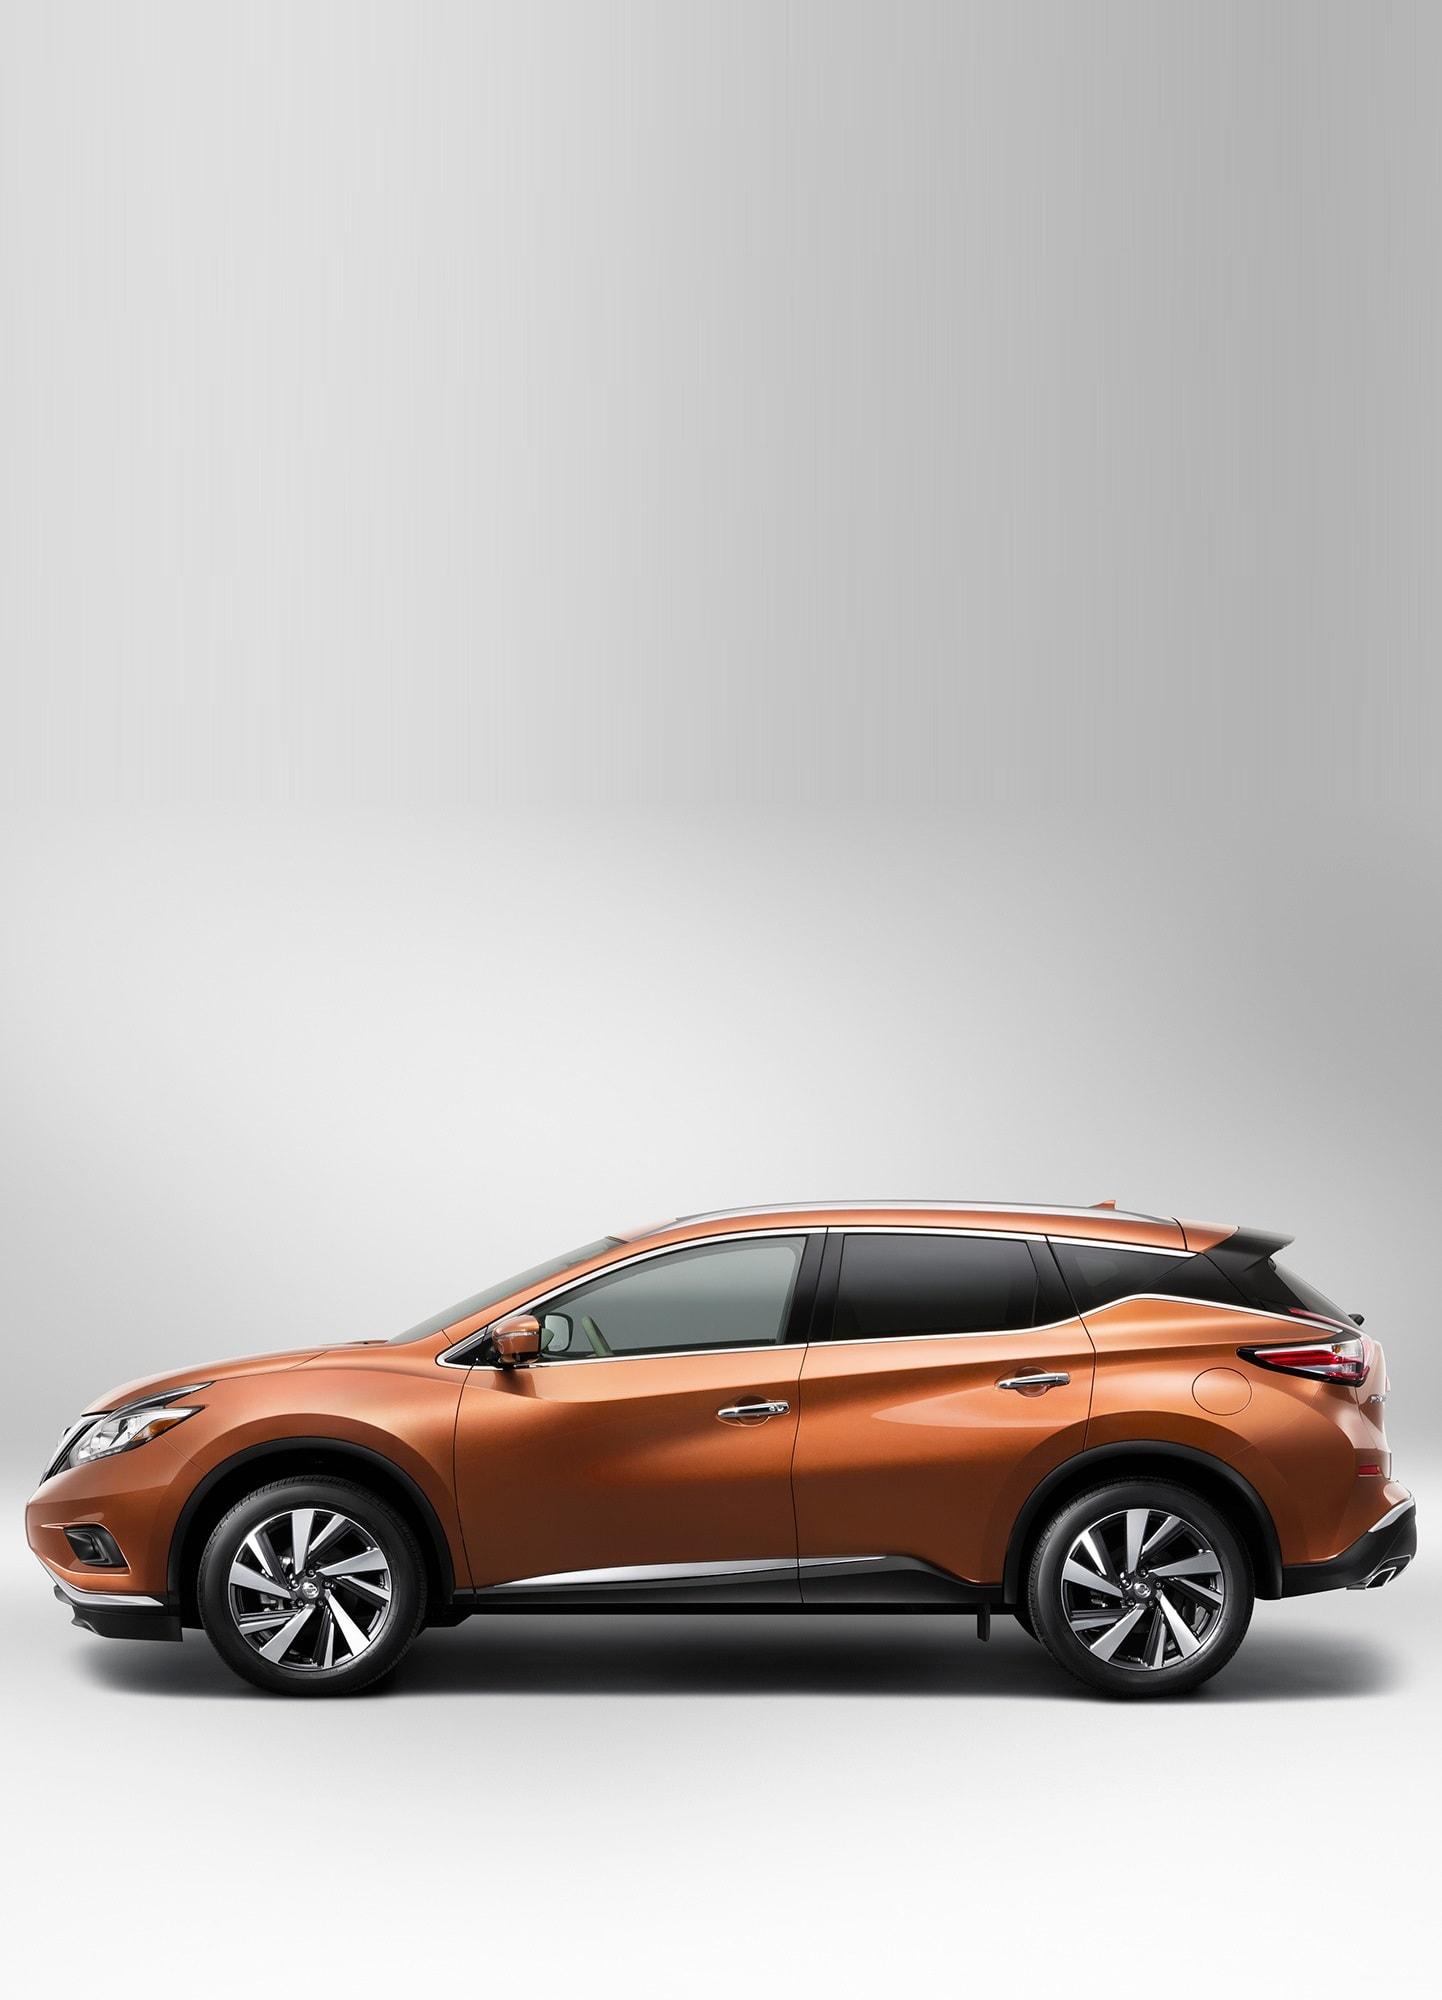 Nissan Murano 3 For mobile